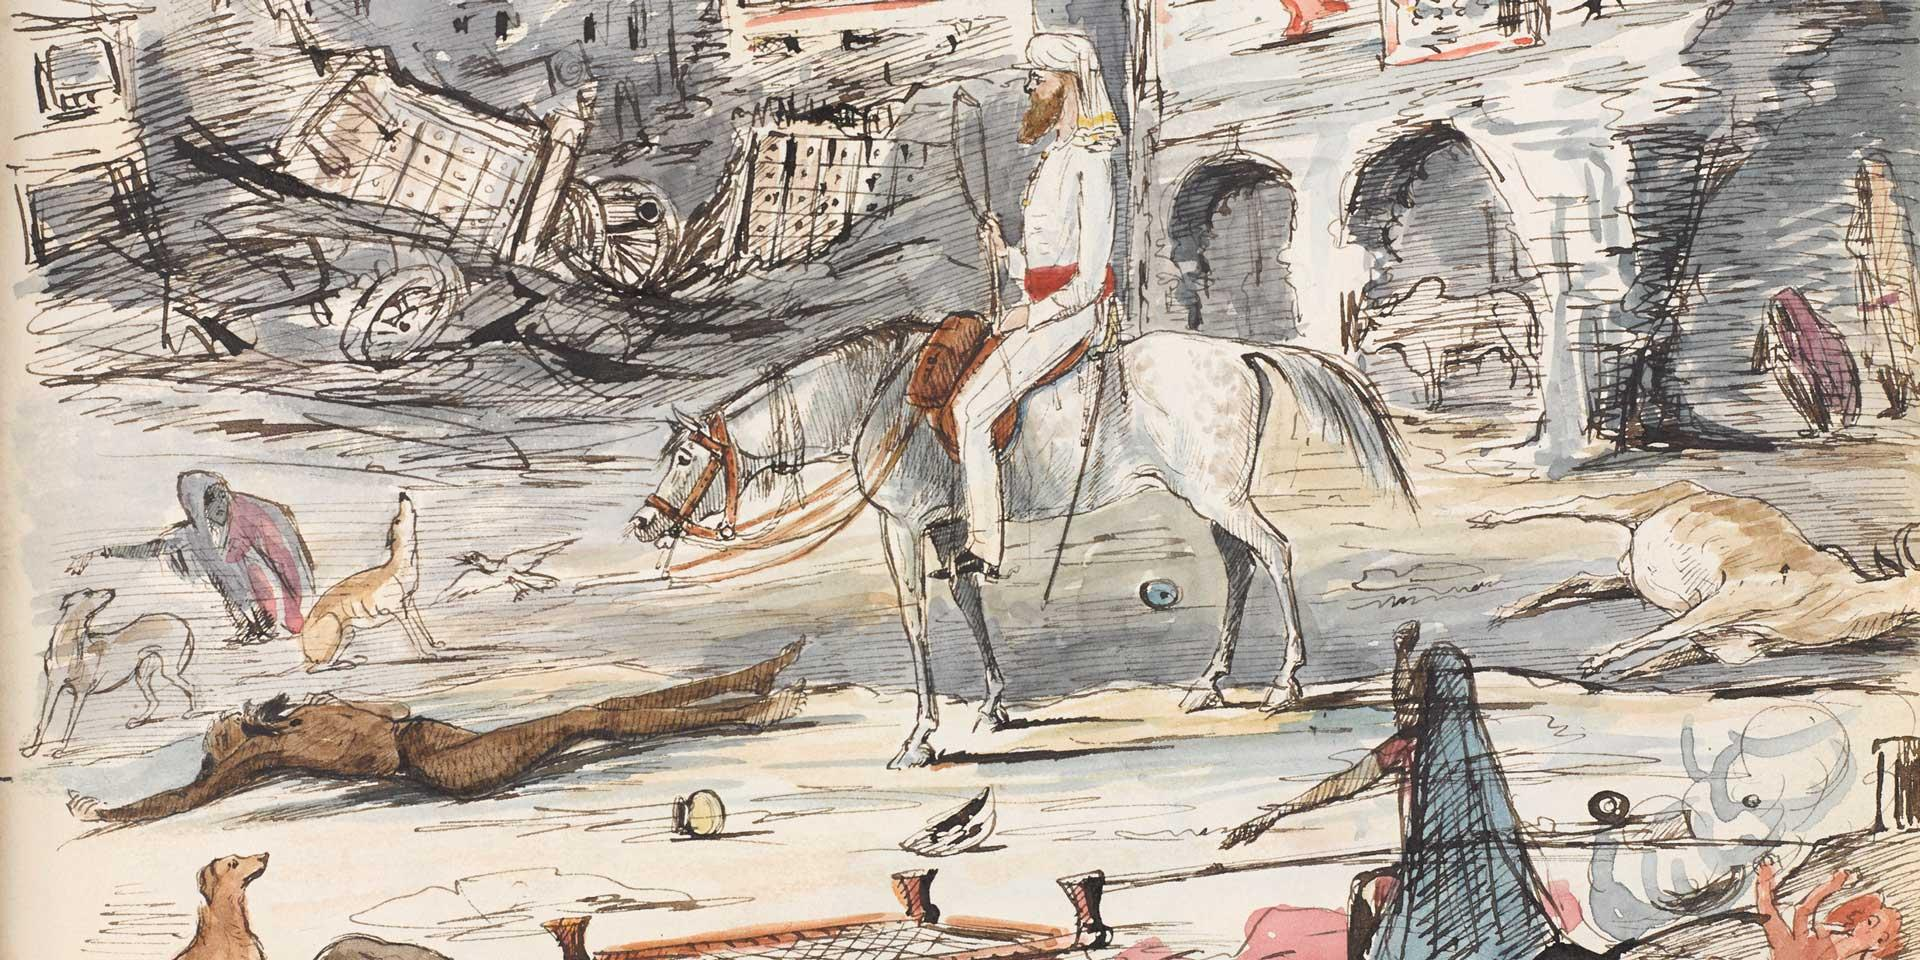 Captain John Crealock, 95th (Derbyshire) Regiment, riding through Kotah after the British assault, 1858